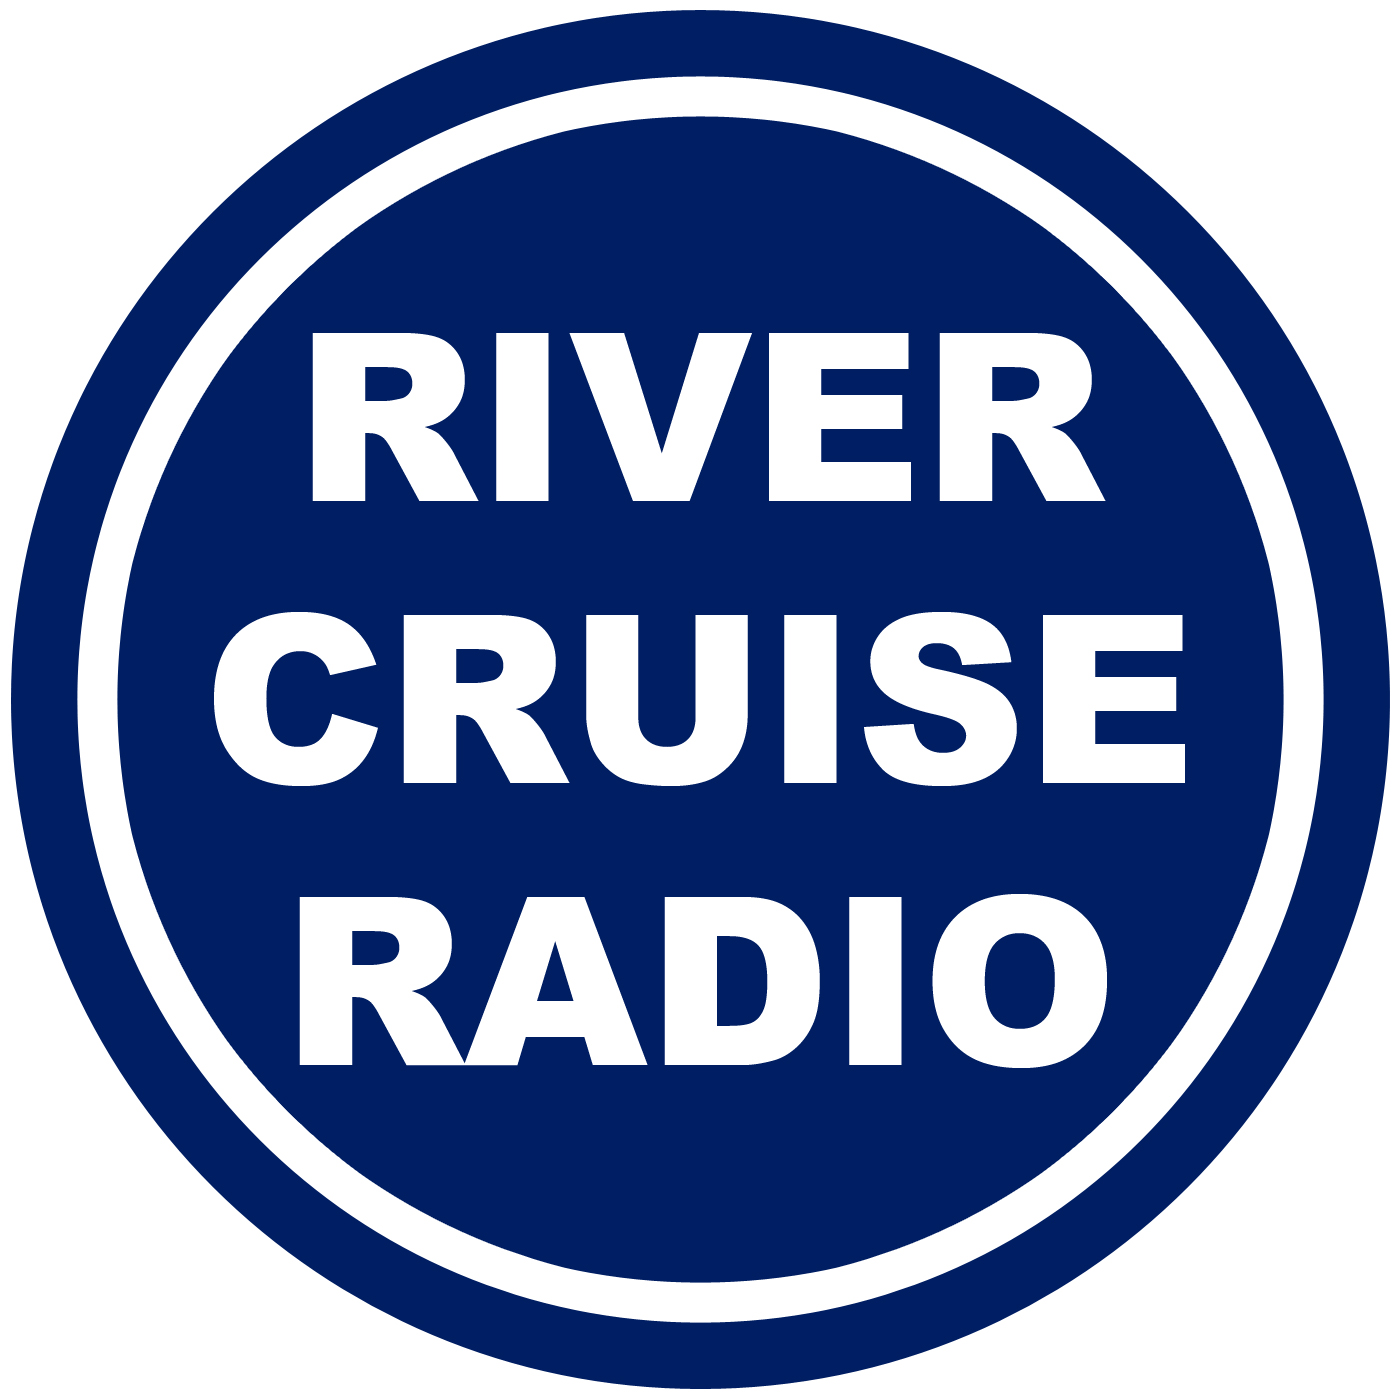 River Cruise Radio